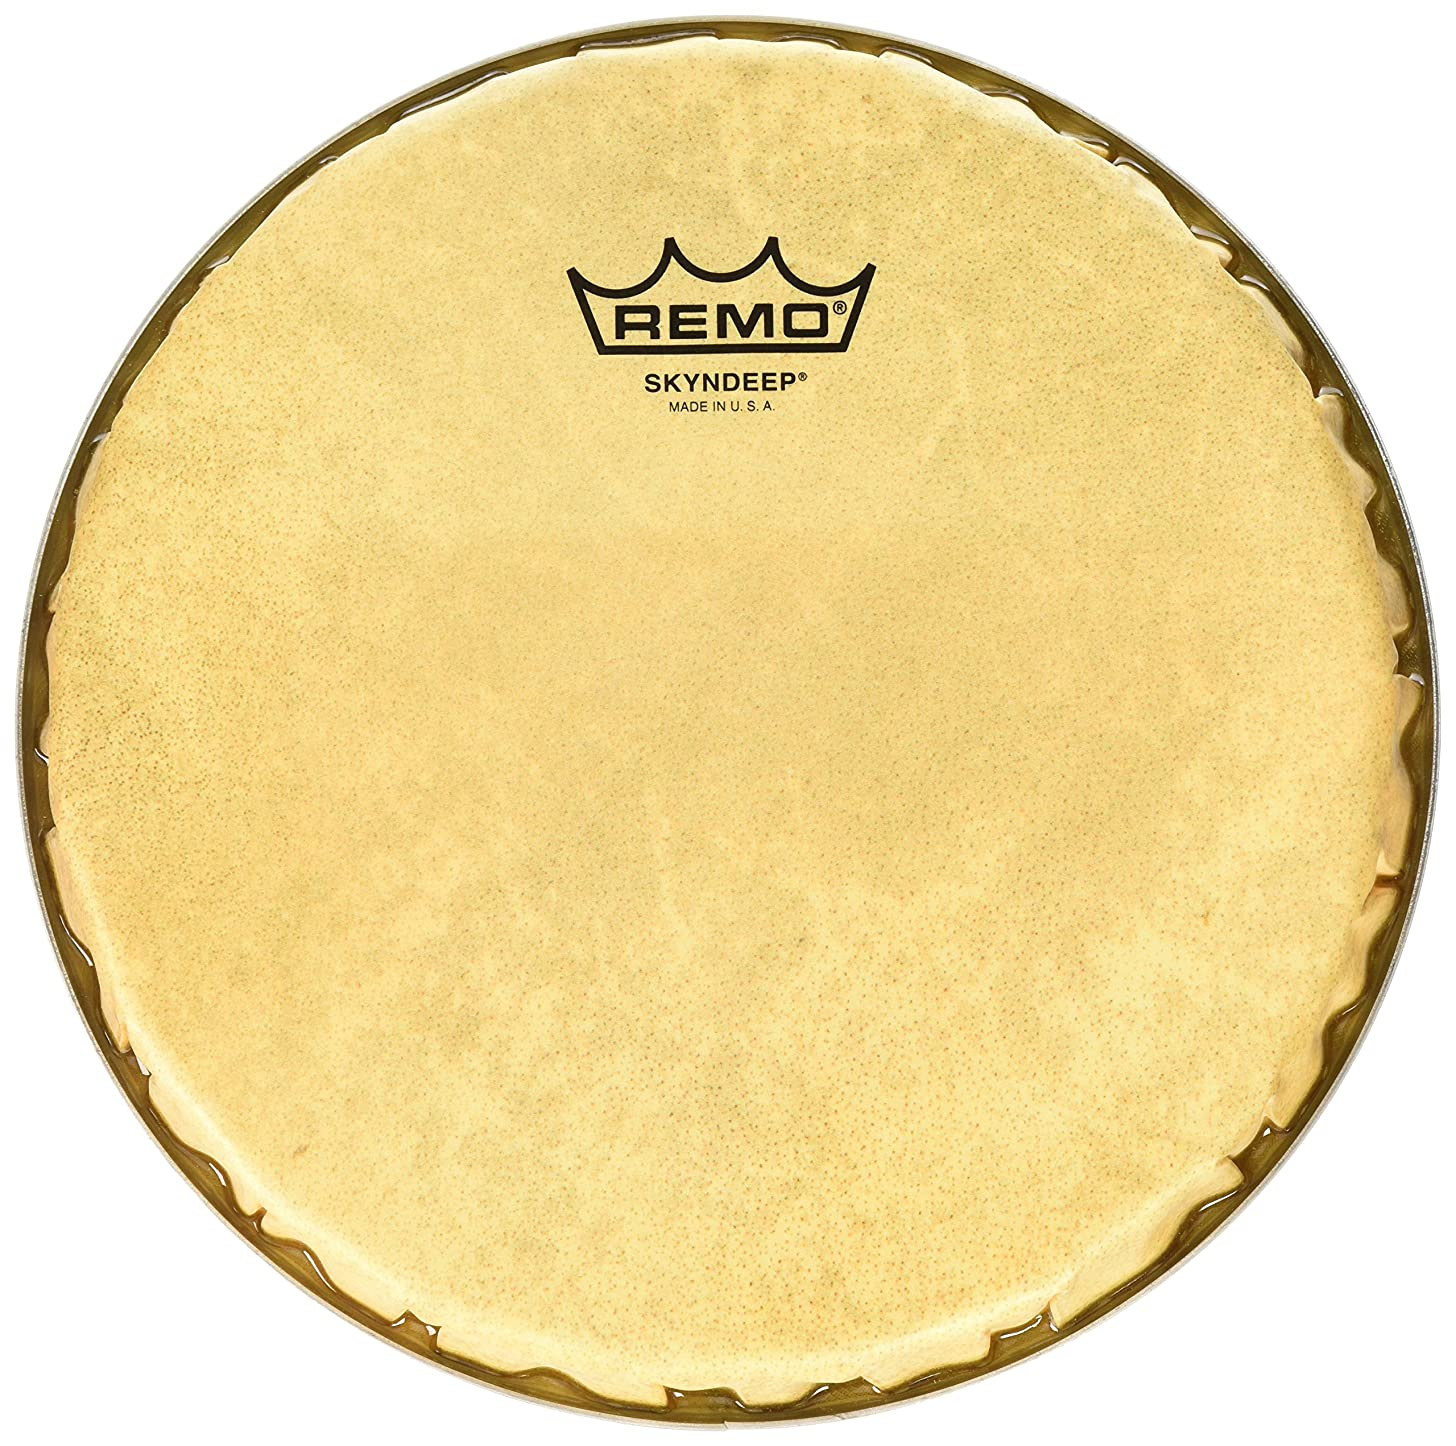 Remo R-Series Skyndeep Bongo Drumhead - Calfskin Graphic, 8.50